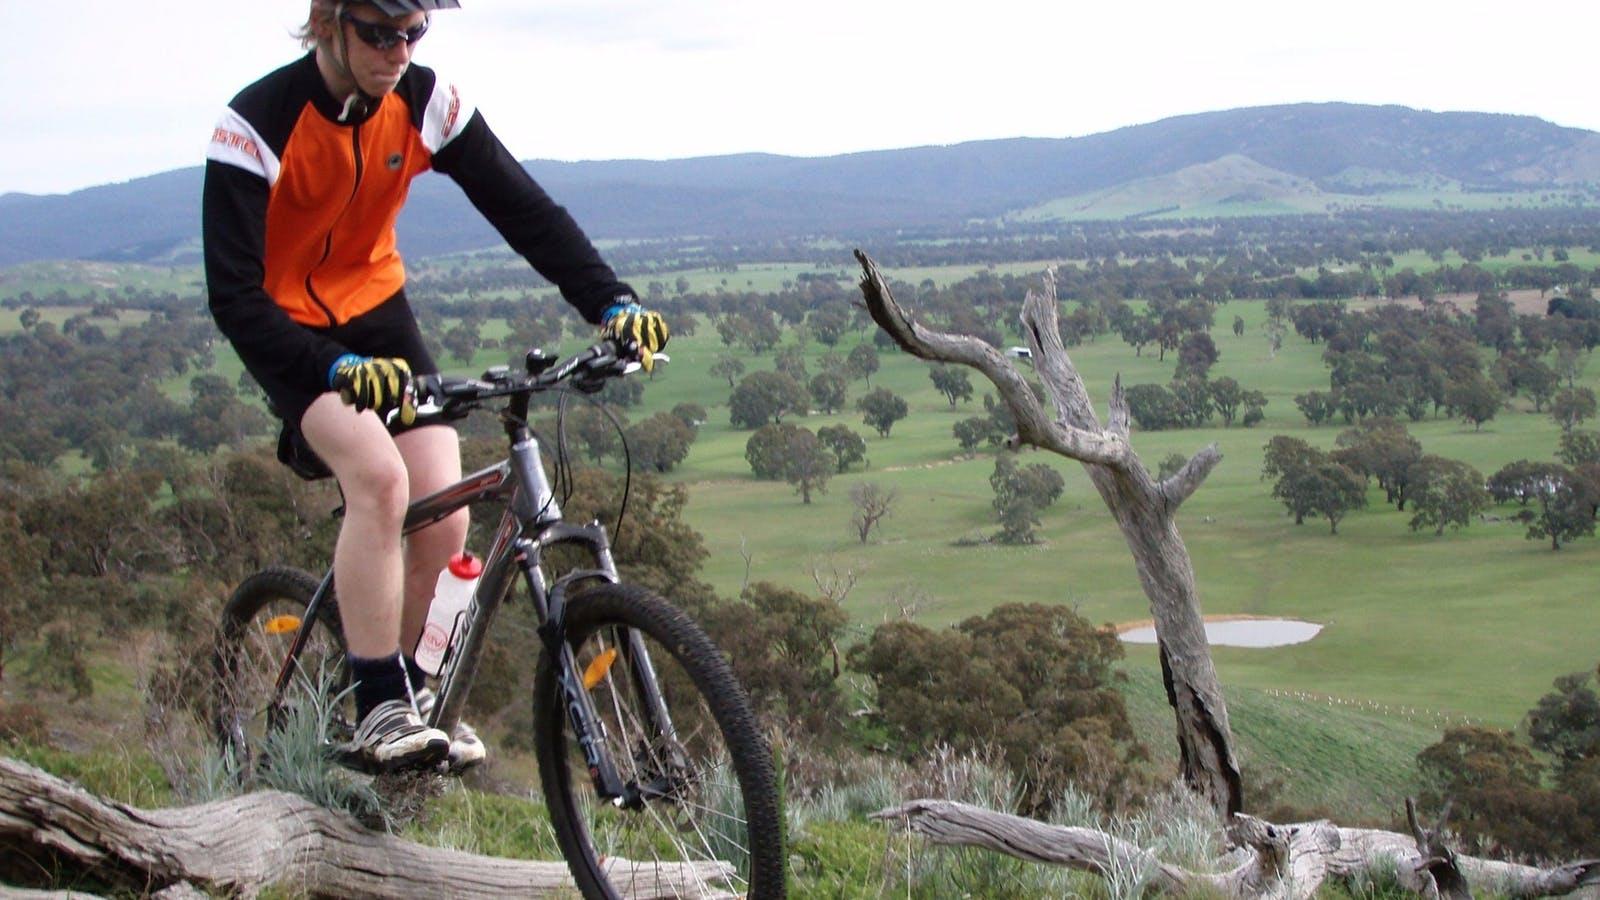 Mountain Bike tracks at Wimmera Hills Winery